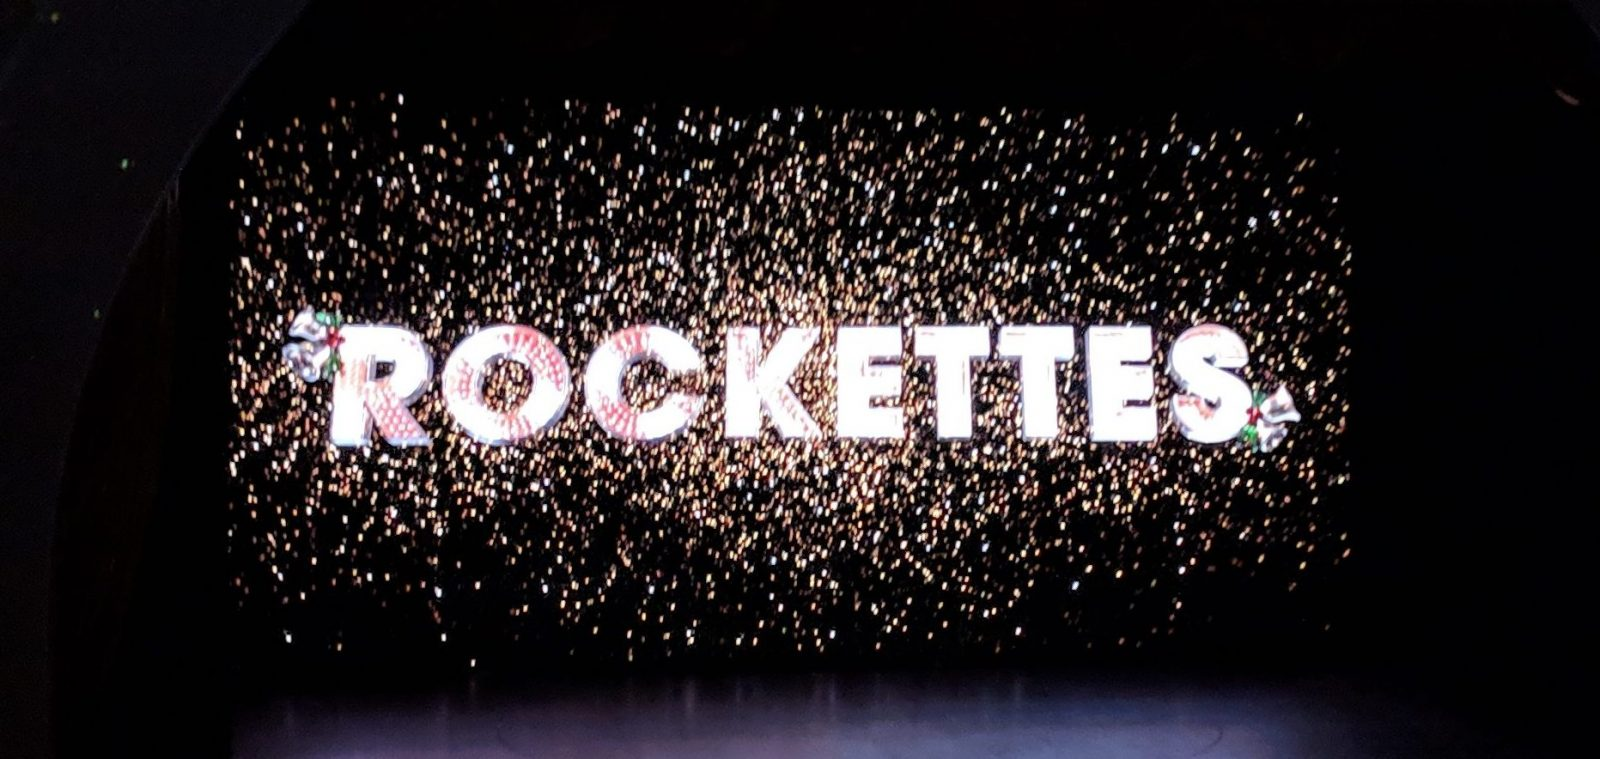 Radio City Rockettes Christmas Spectacular - Intel Drones - 12